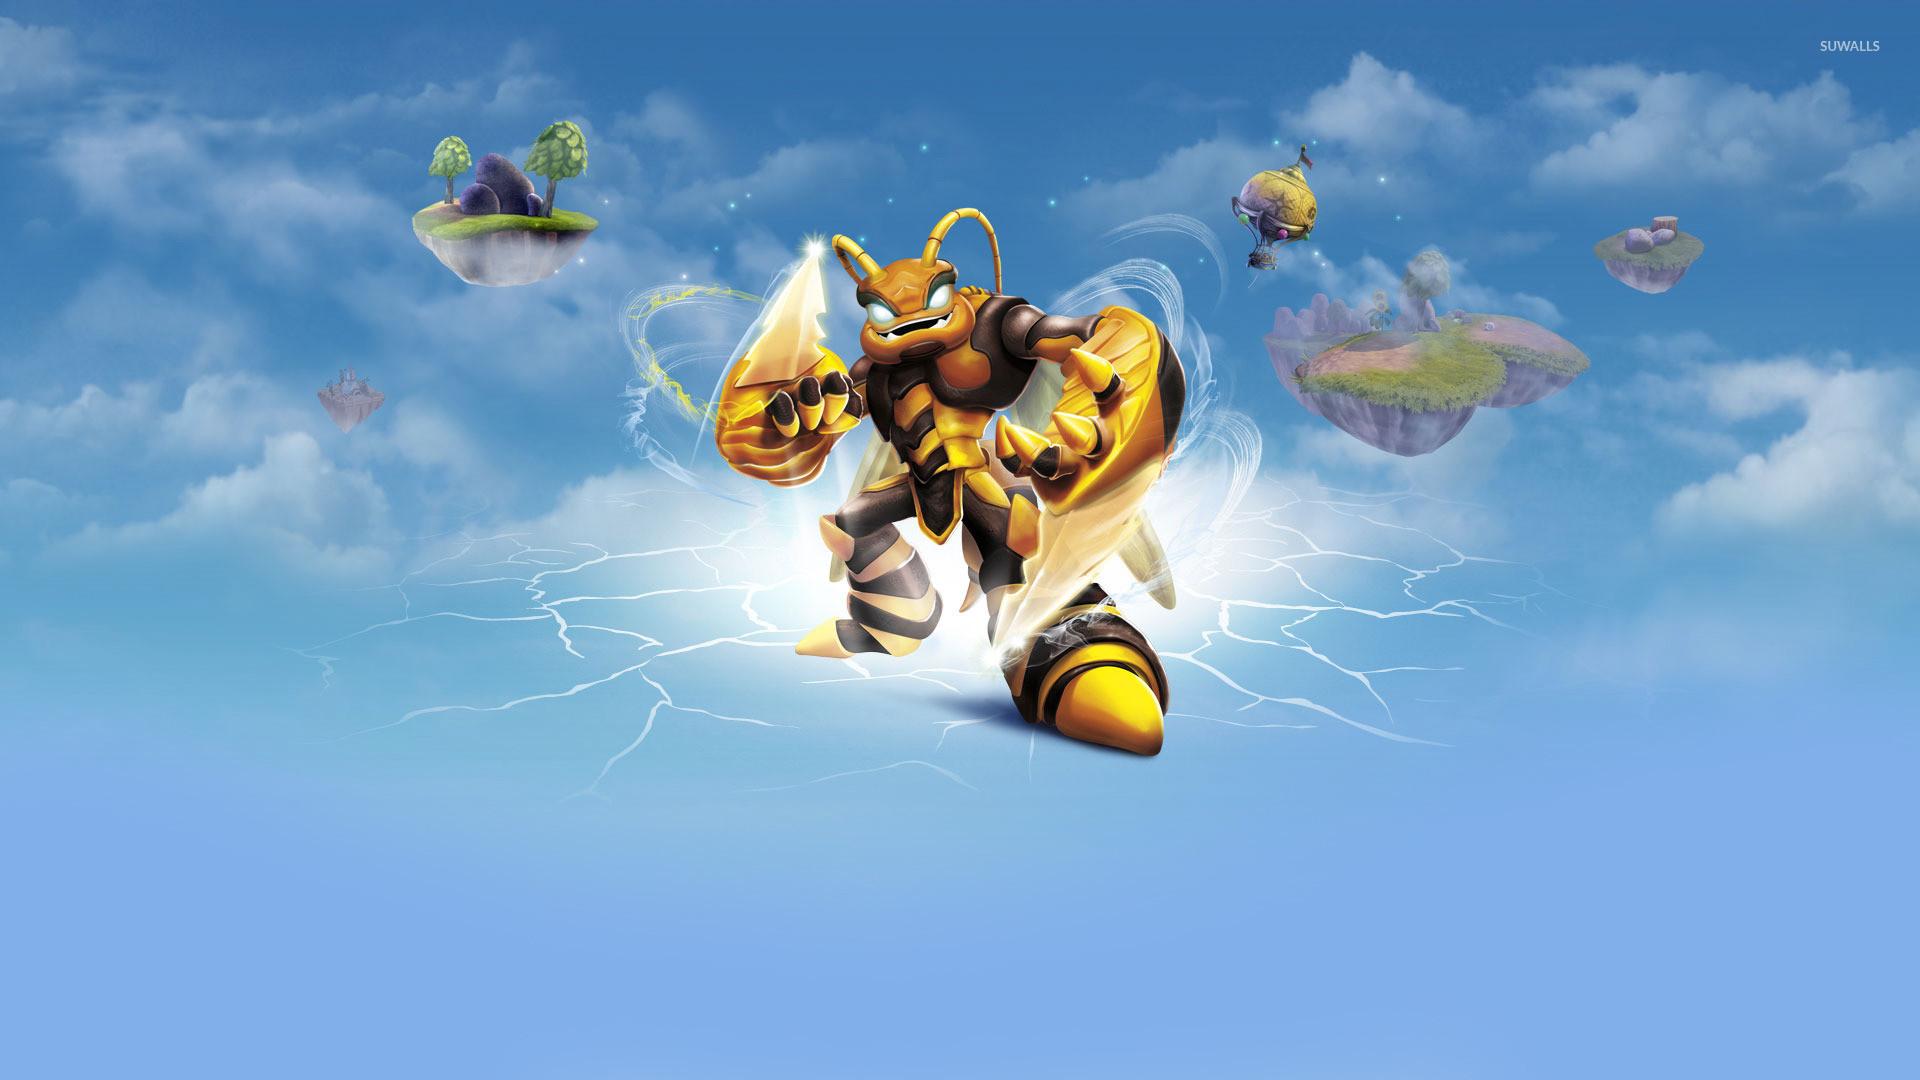 Swarm – Skylanders: Giants : Desktop and mobile wallpaper : Wallippo